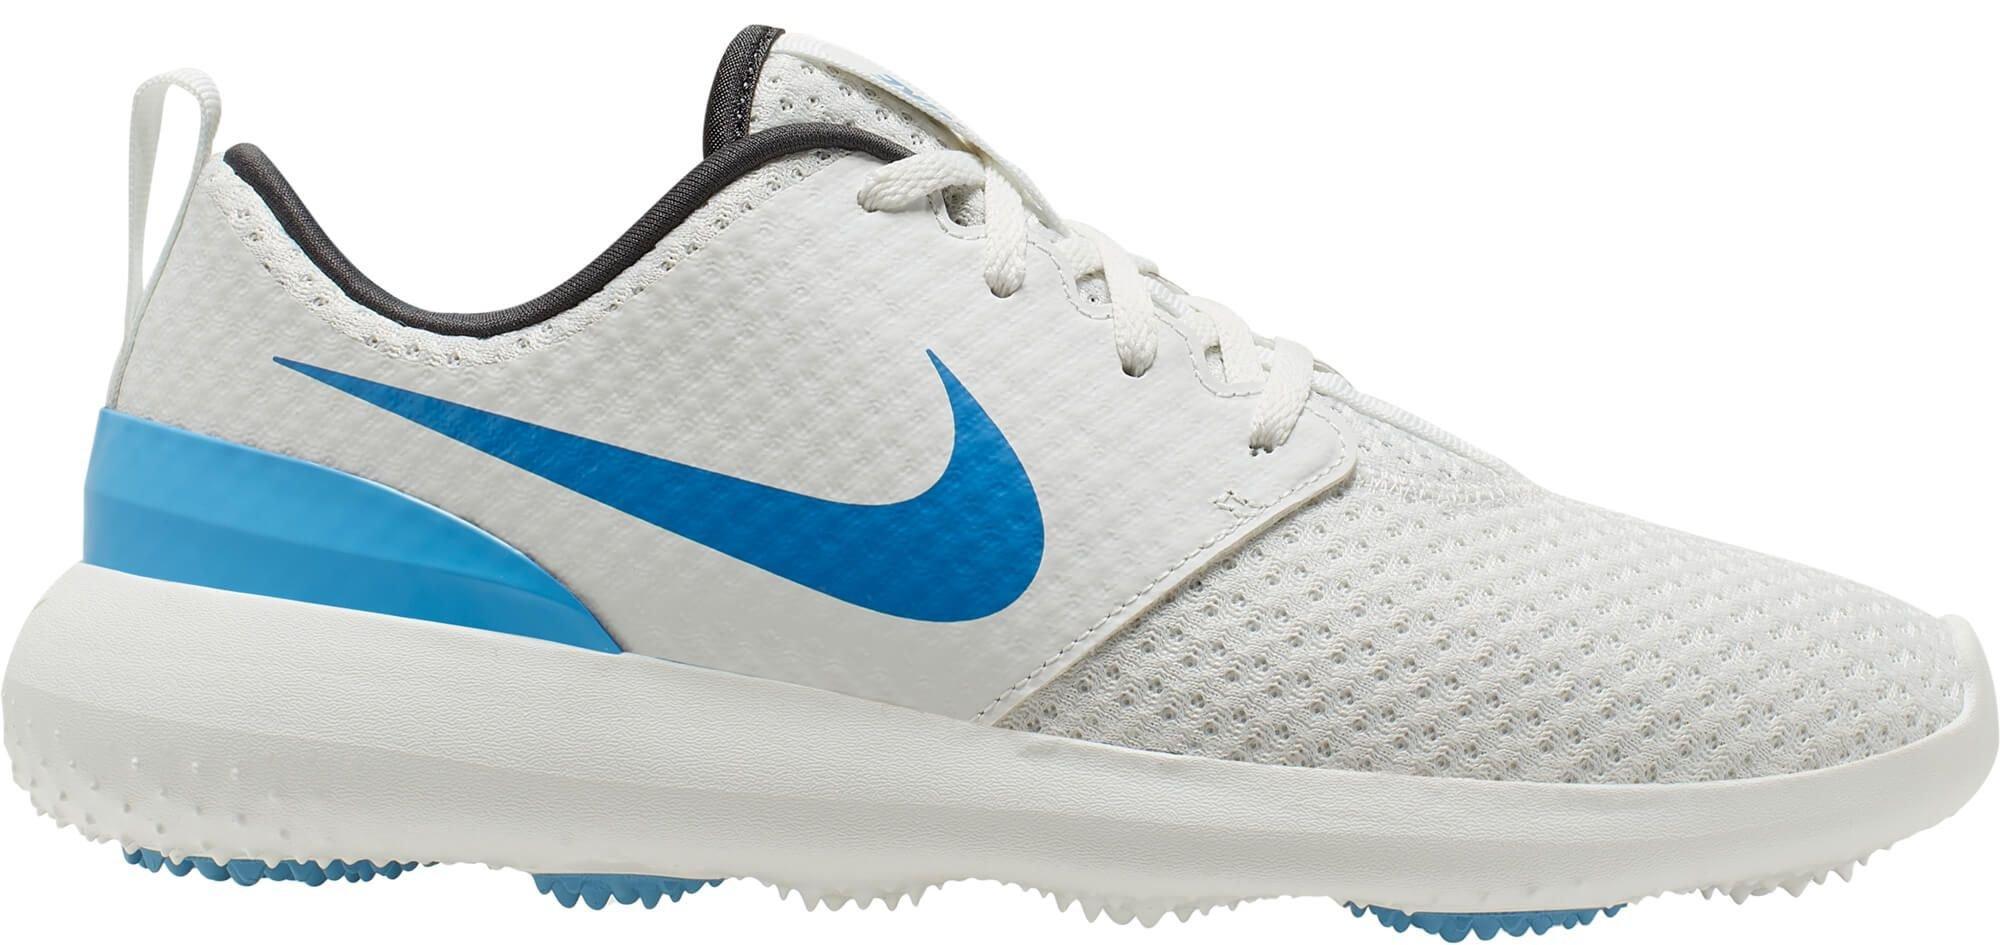 reinado procedimiento laberinto  Nike Roshe G Golf Shoes 2020 Summit White/University Blue/Anthracite -  Carl's Golfland